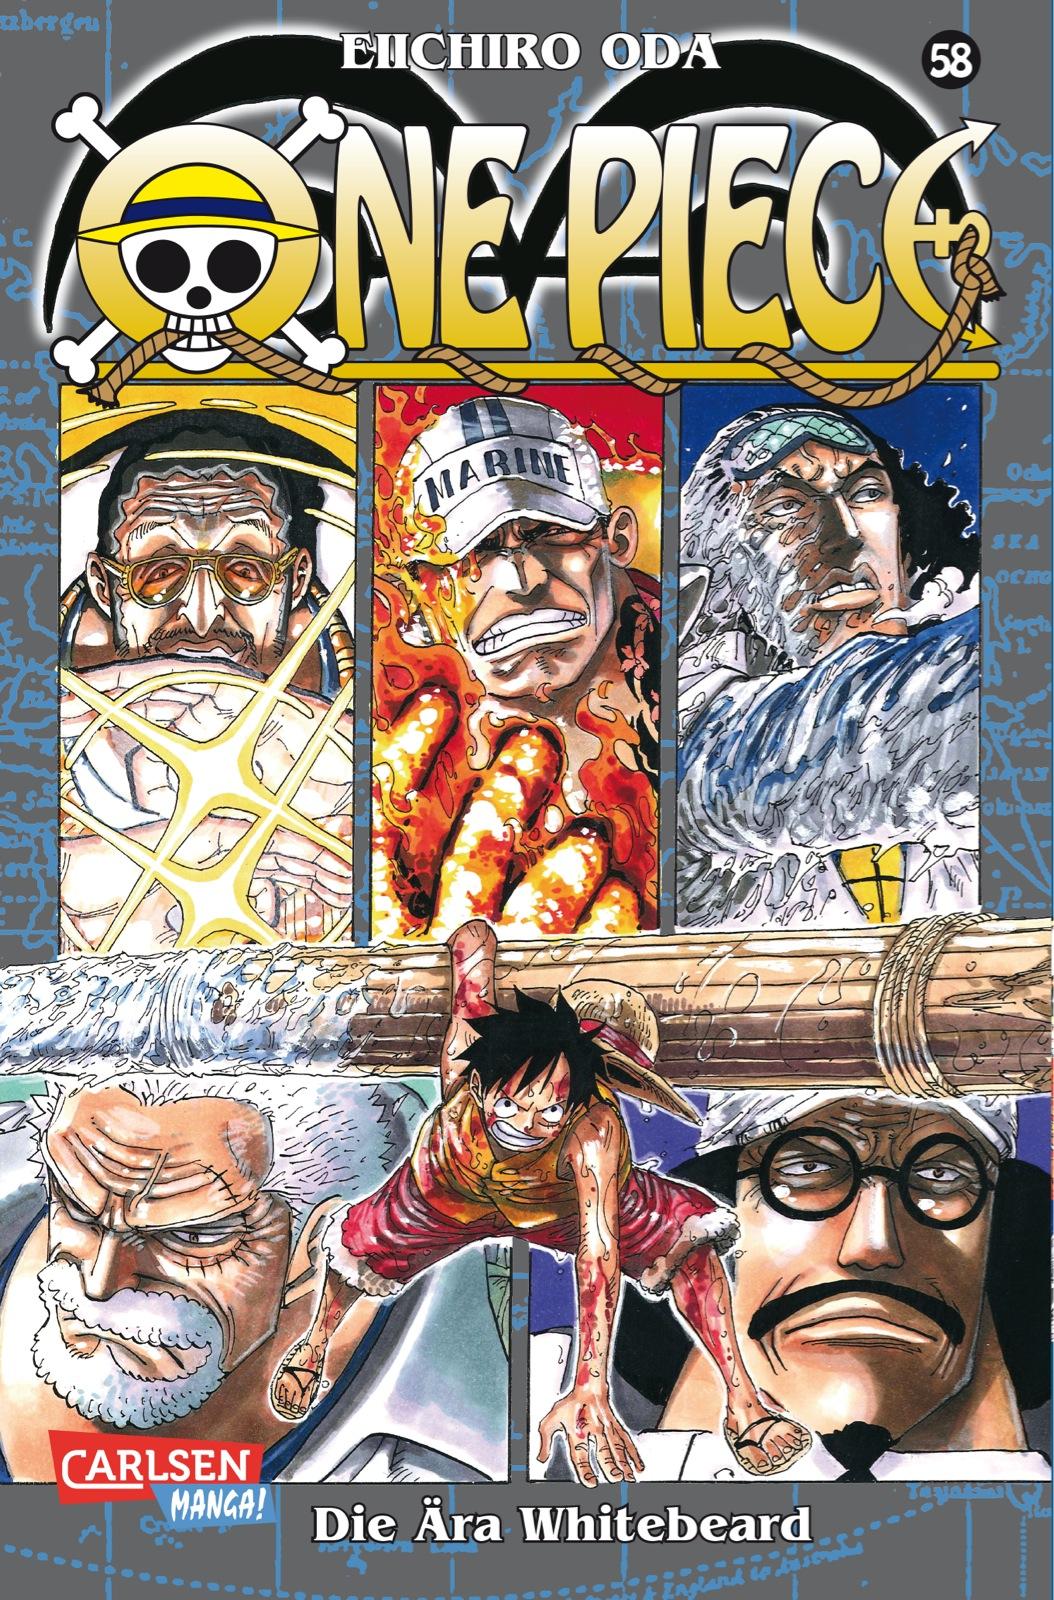 One Piece - Band 58 - Eiichiro Oda